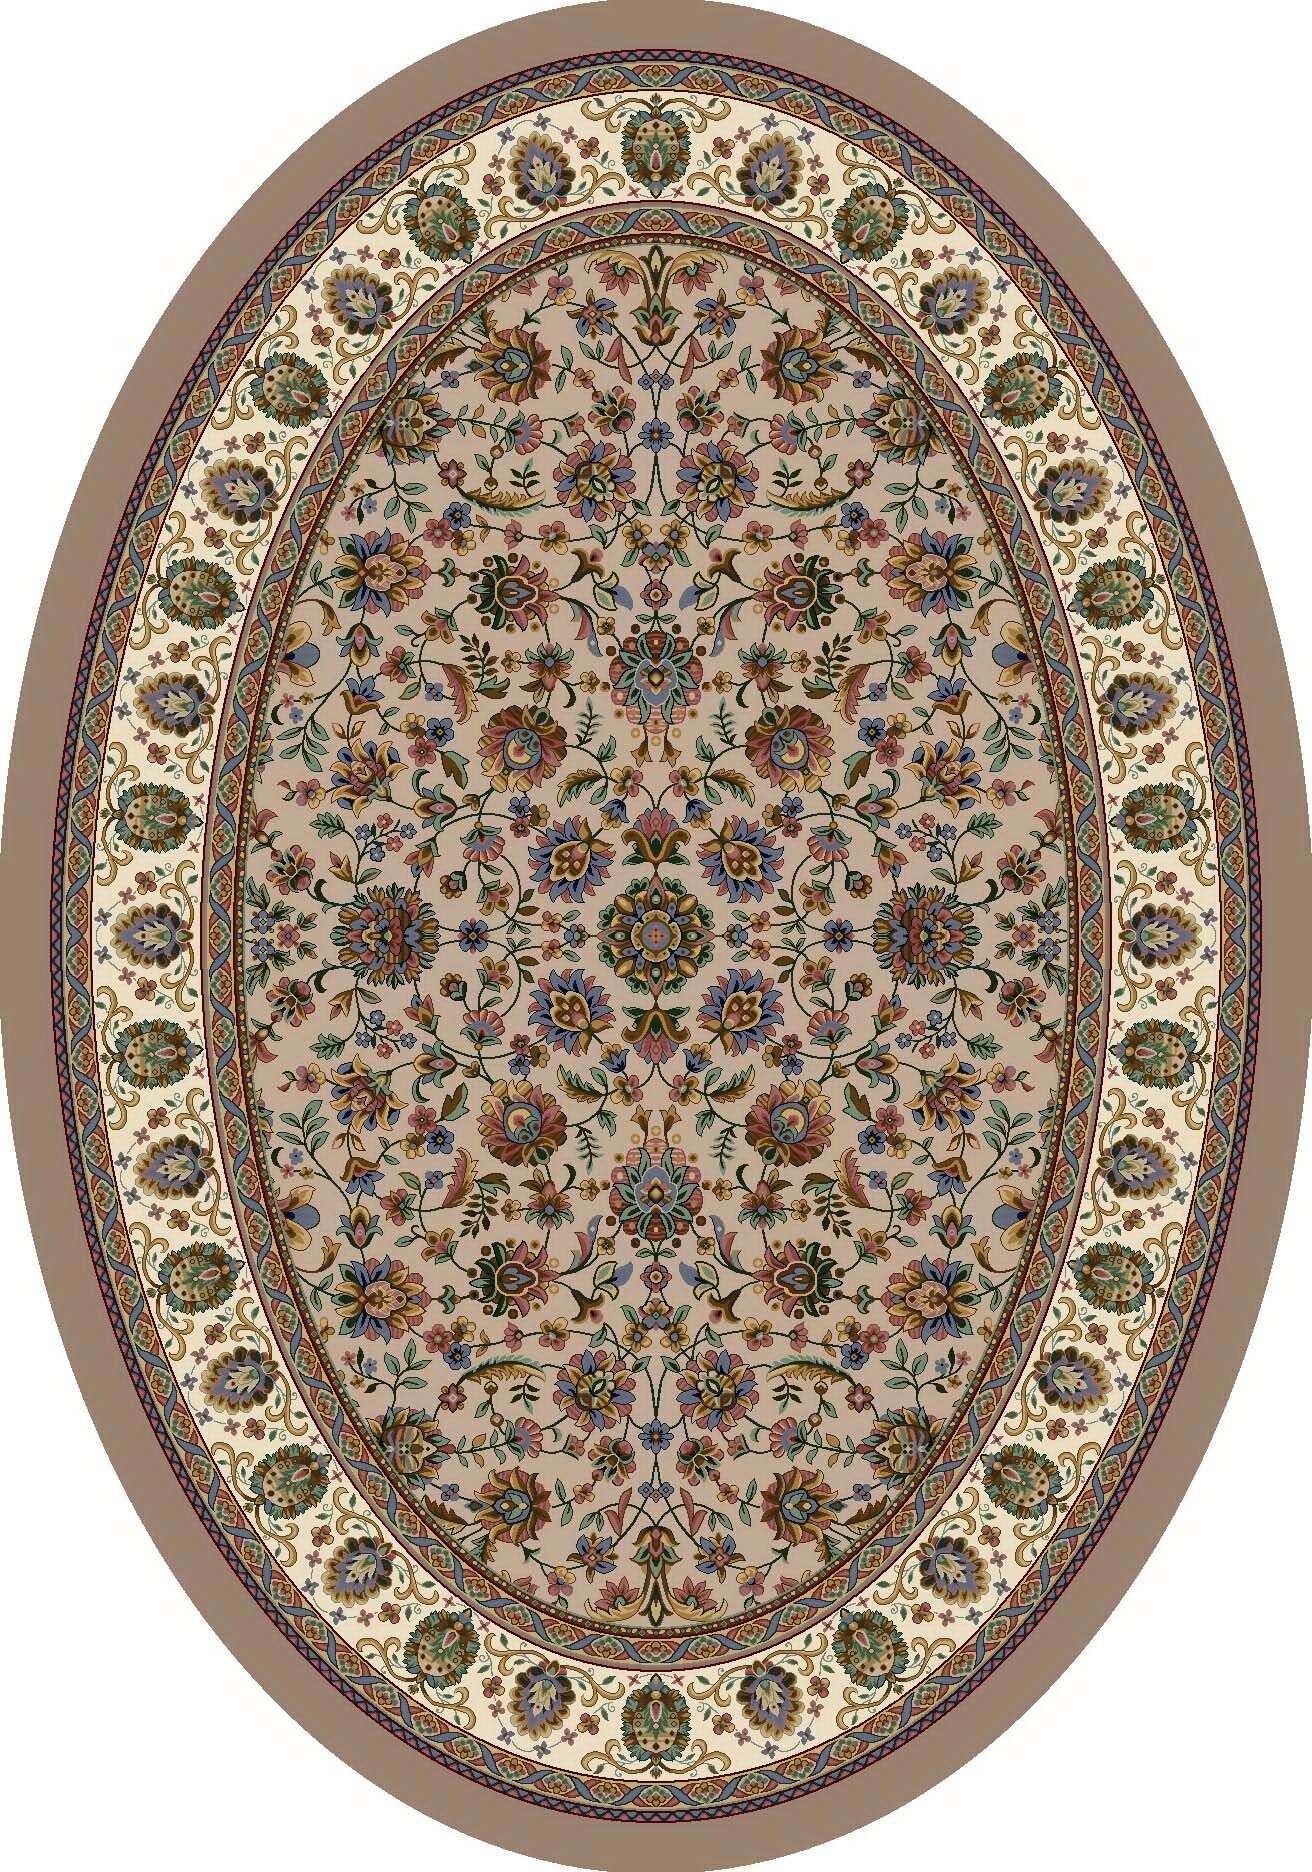 Signature Persian Palace Sandstone Area Rug Rug Size: Oval 3'10